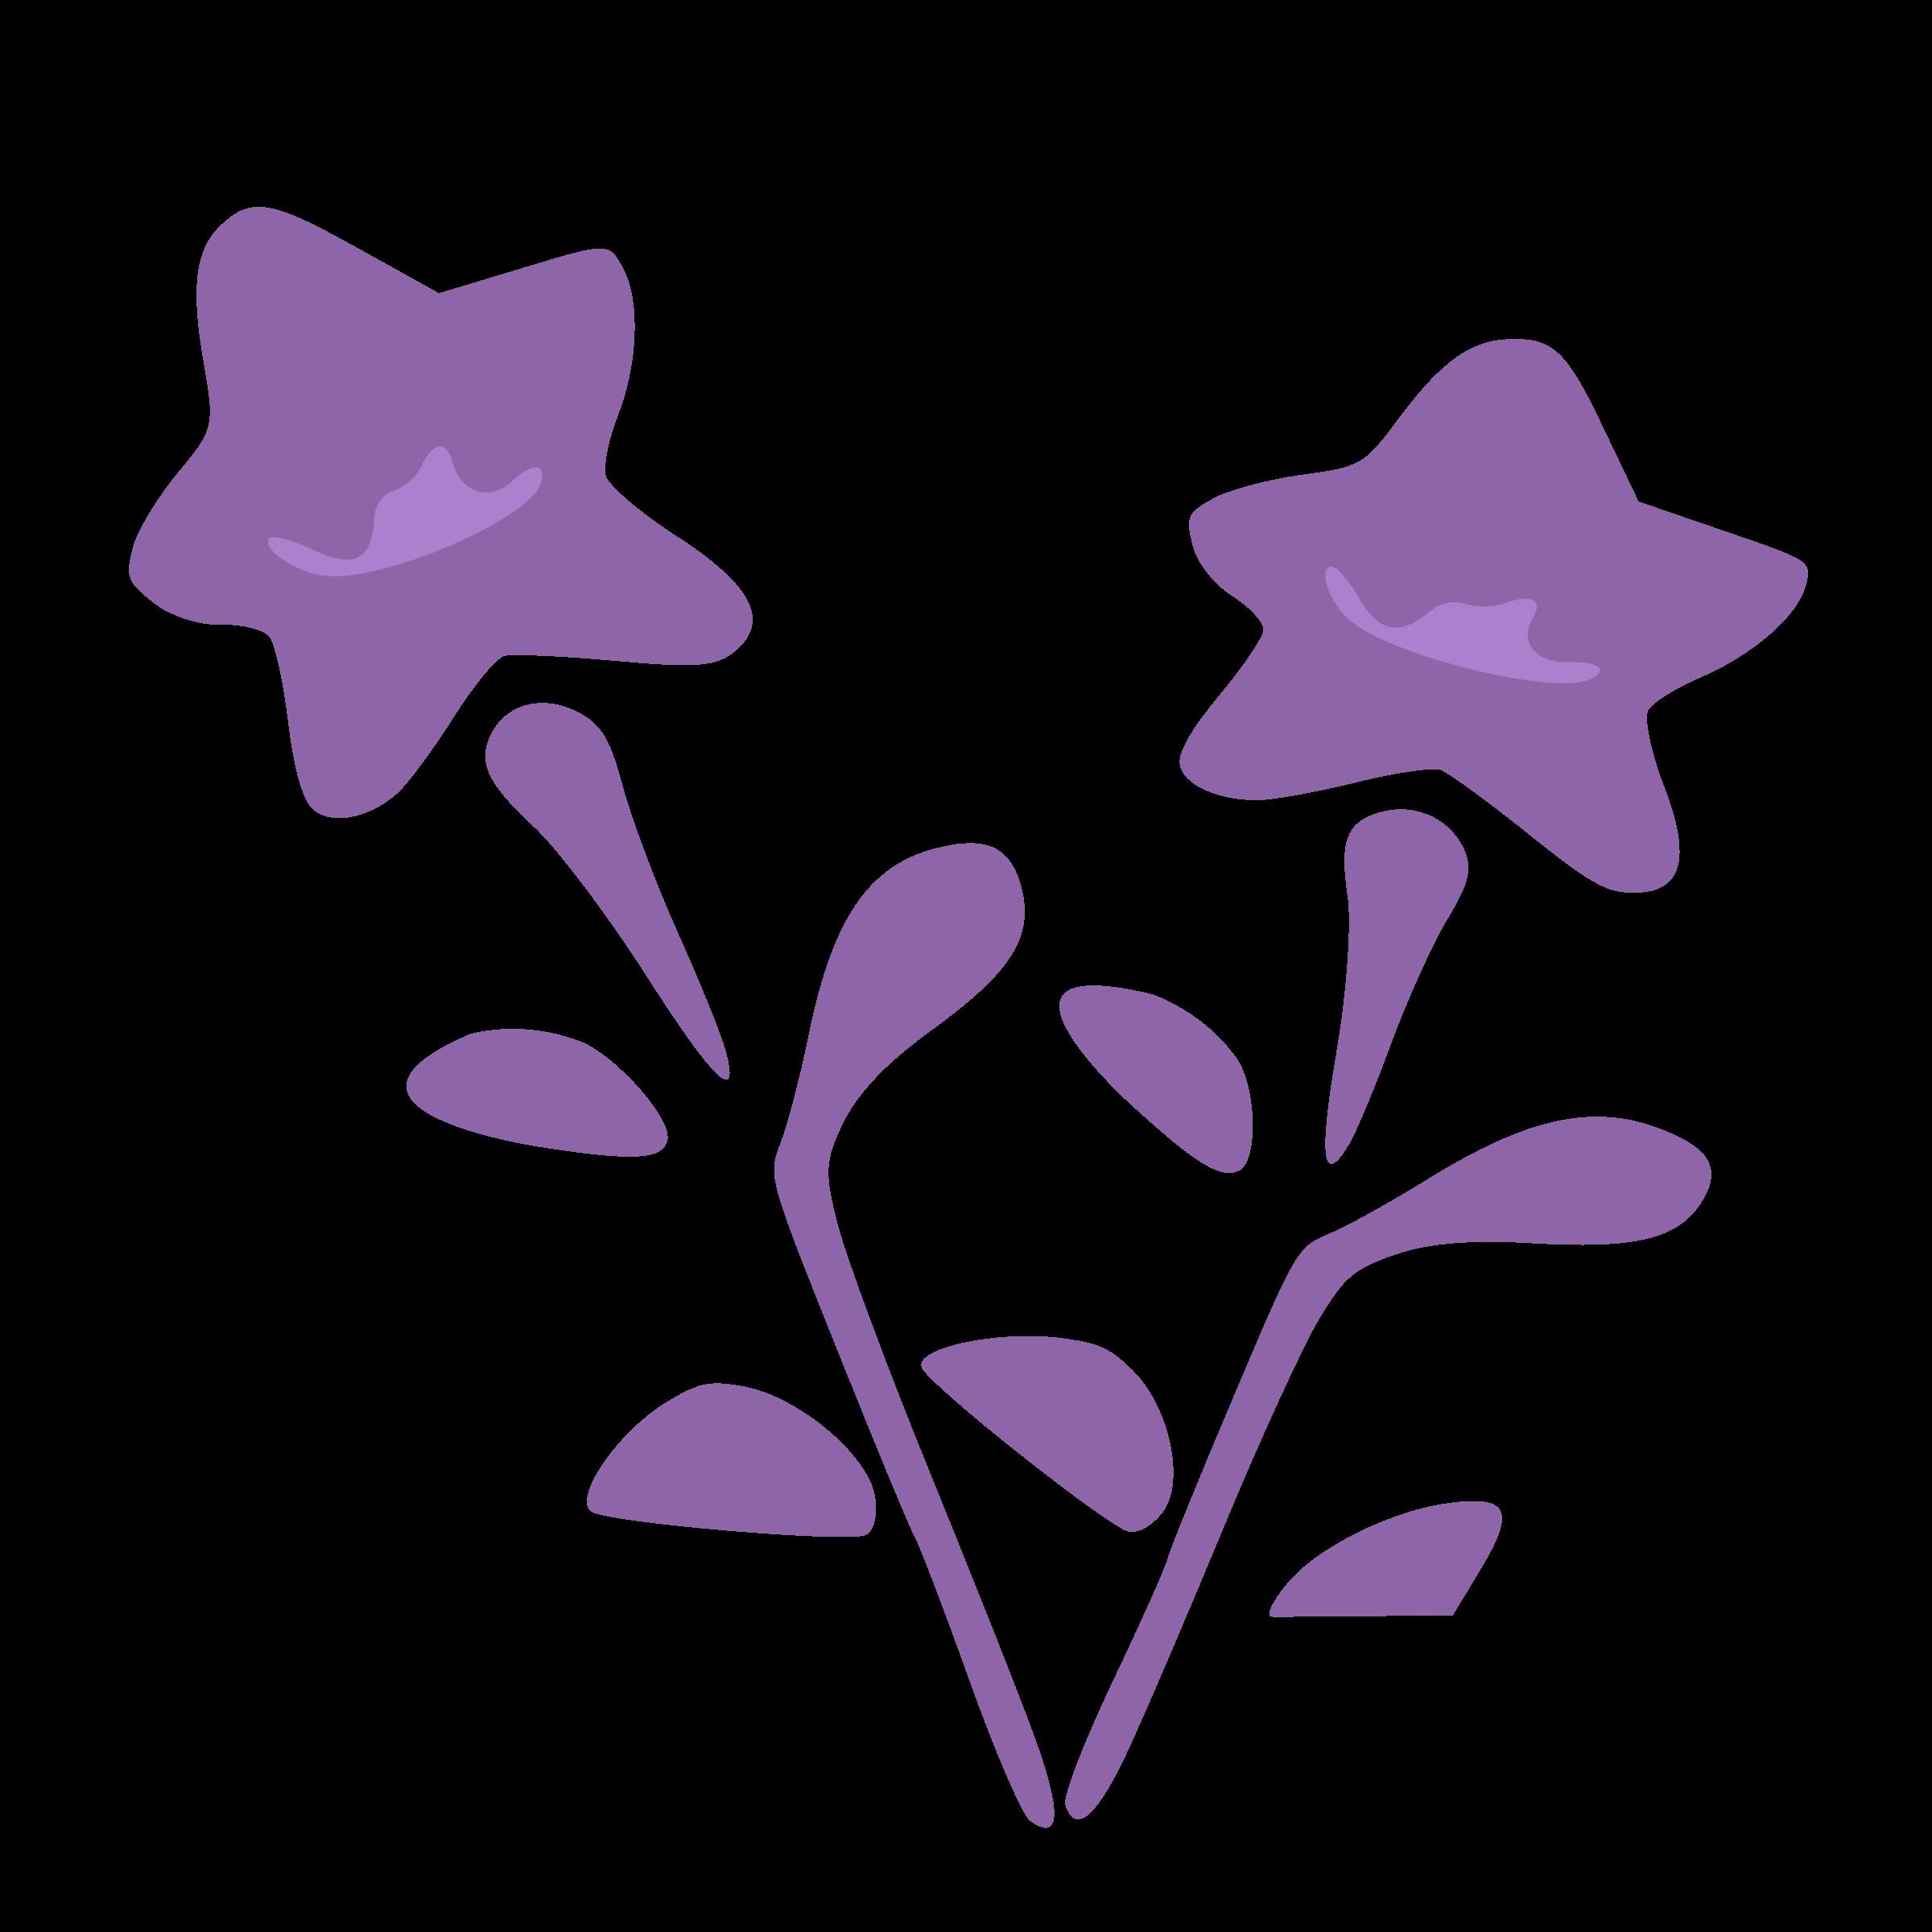 Flower design clipart clipart download Clipart - Flower-design clipart download